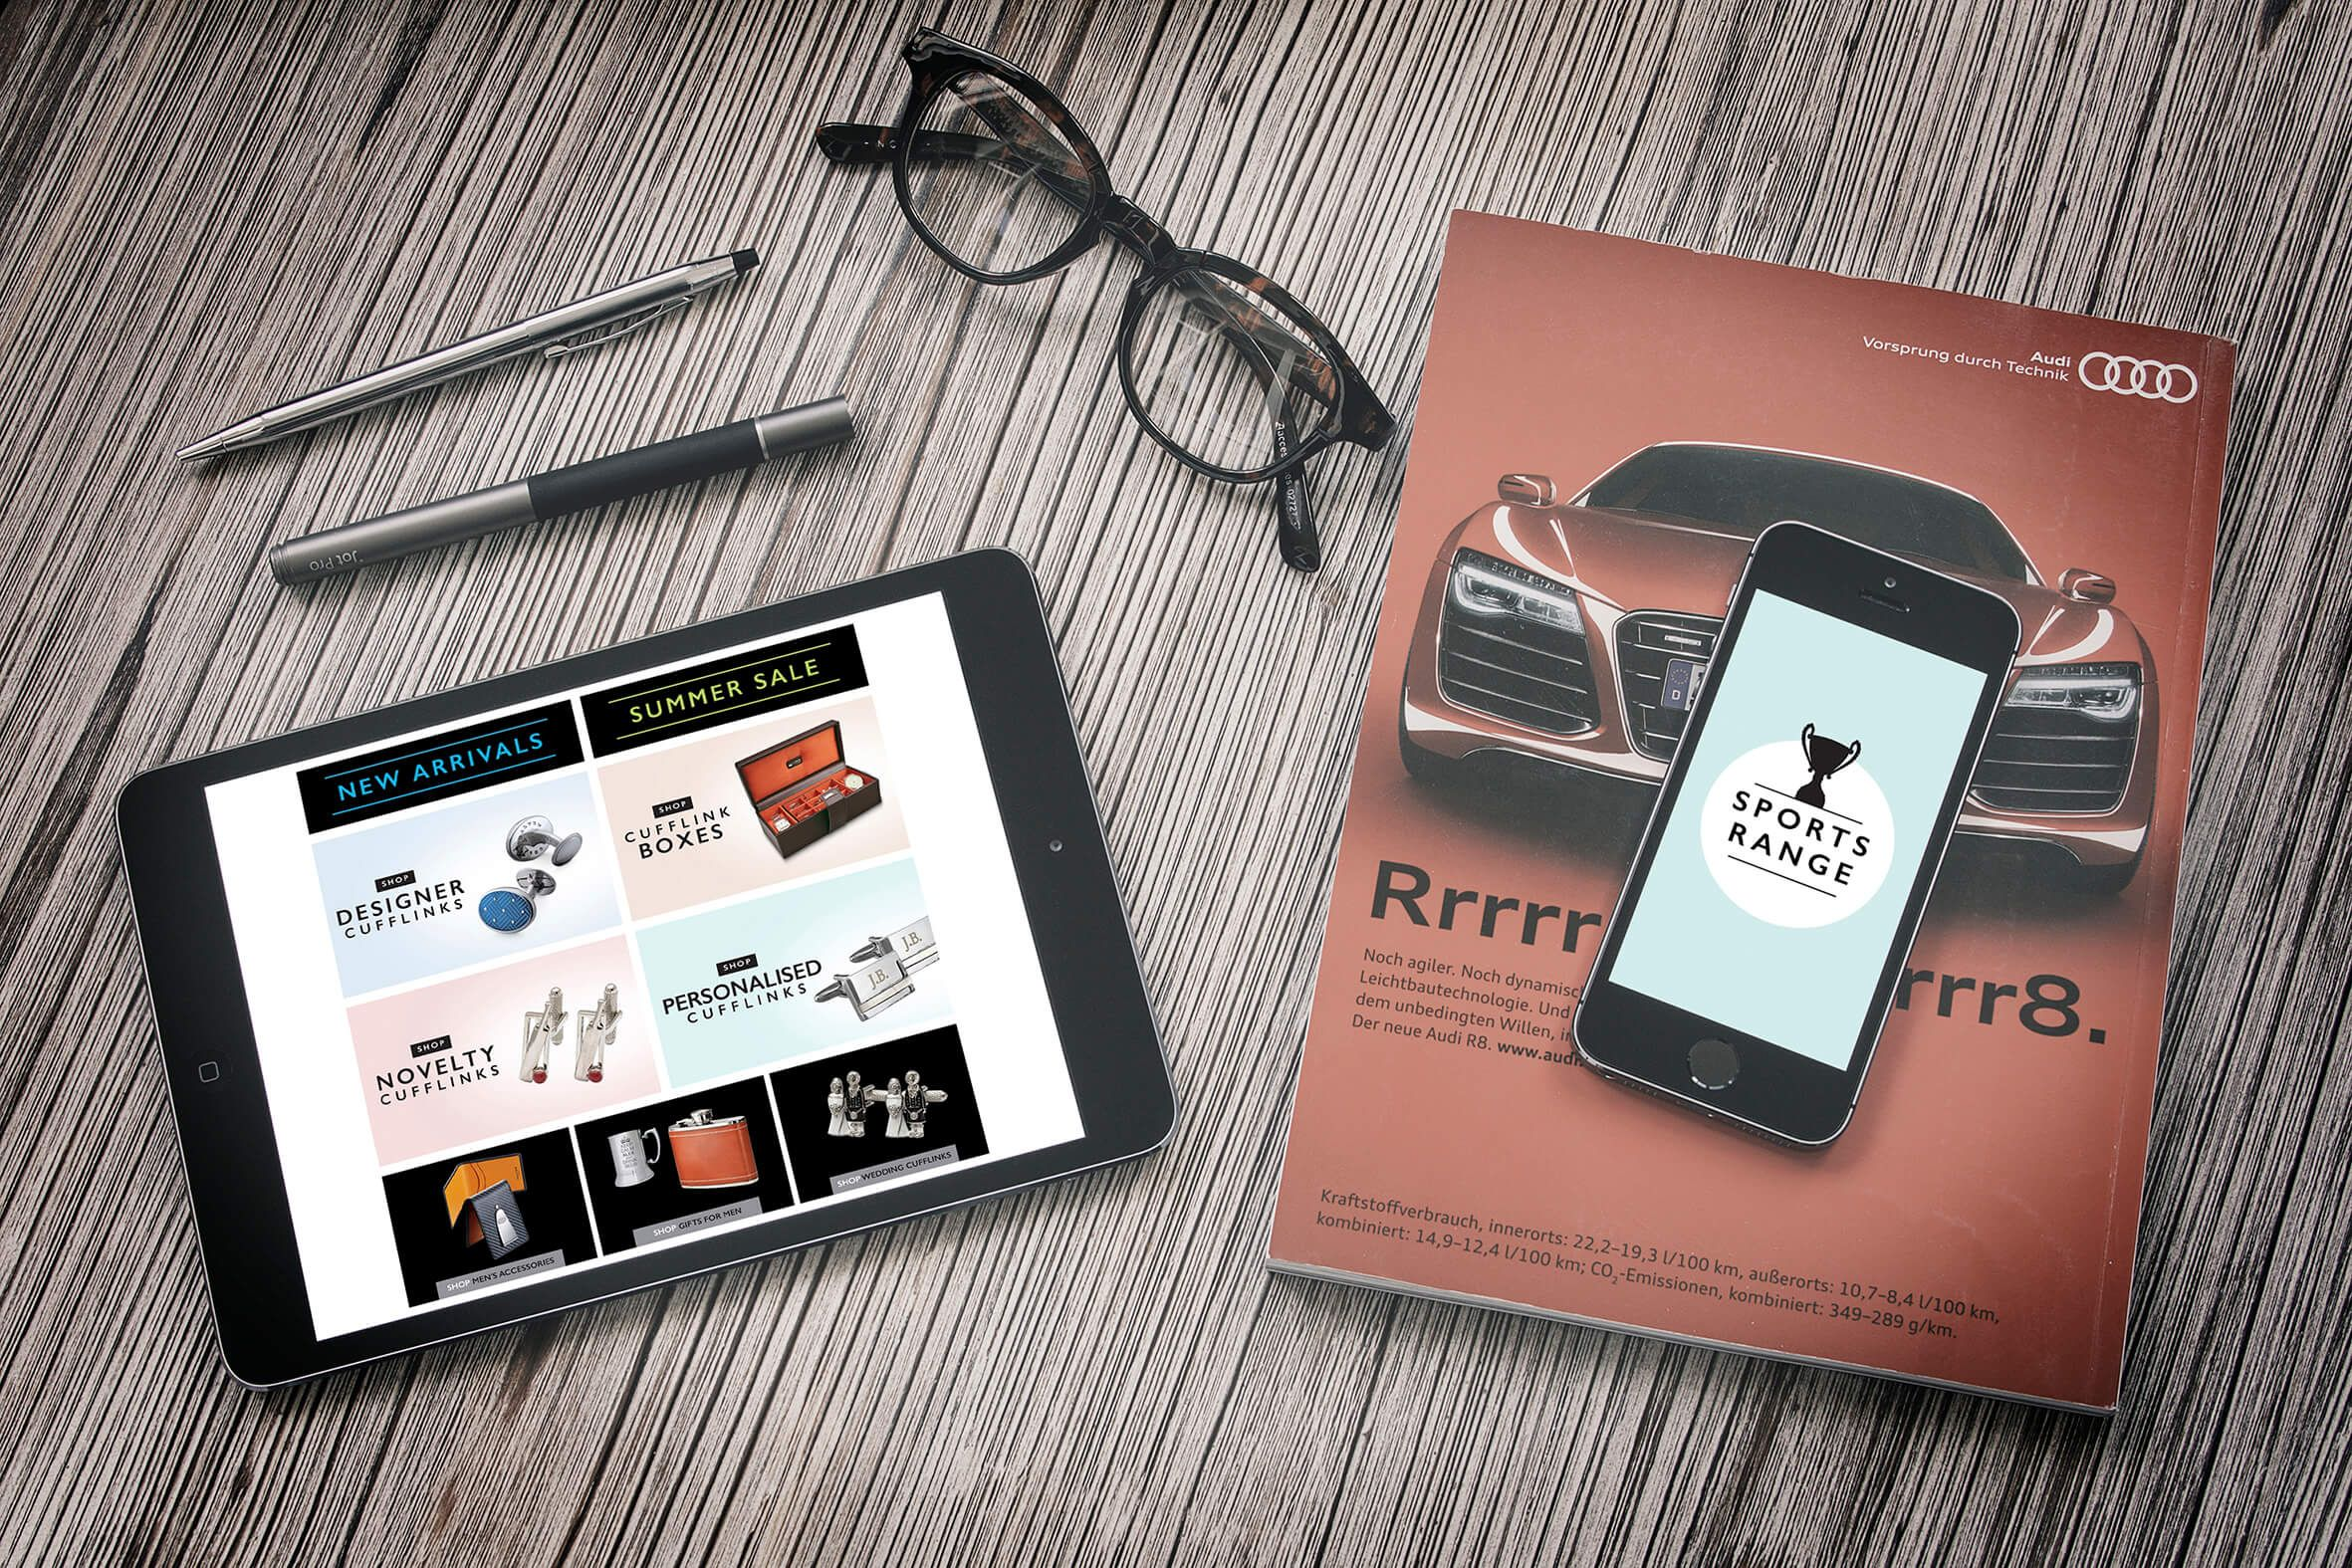 A new homepage design for www.cufflinkman.co.uk by Create Onsight - www.createonsight.co.uk